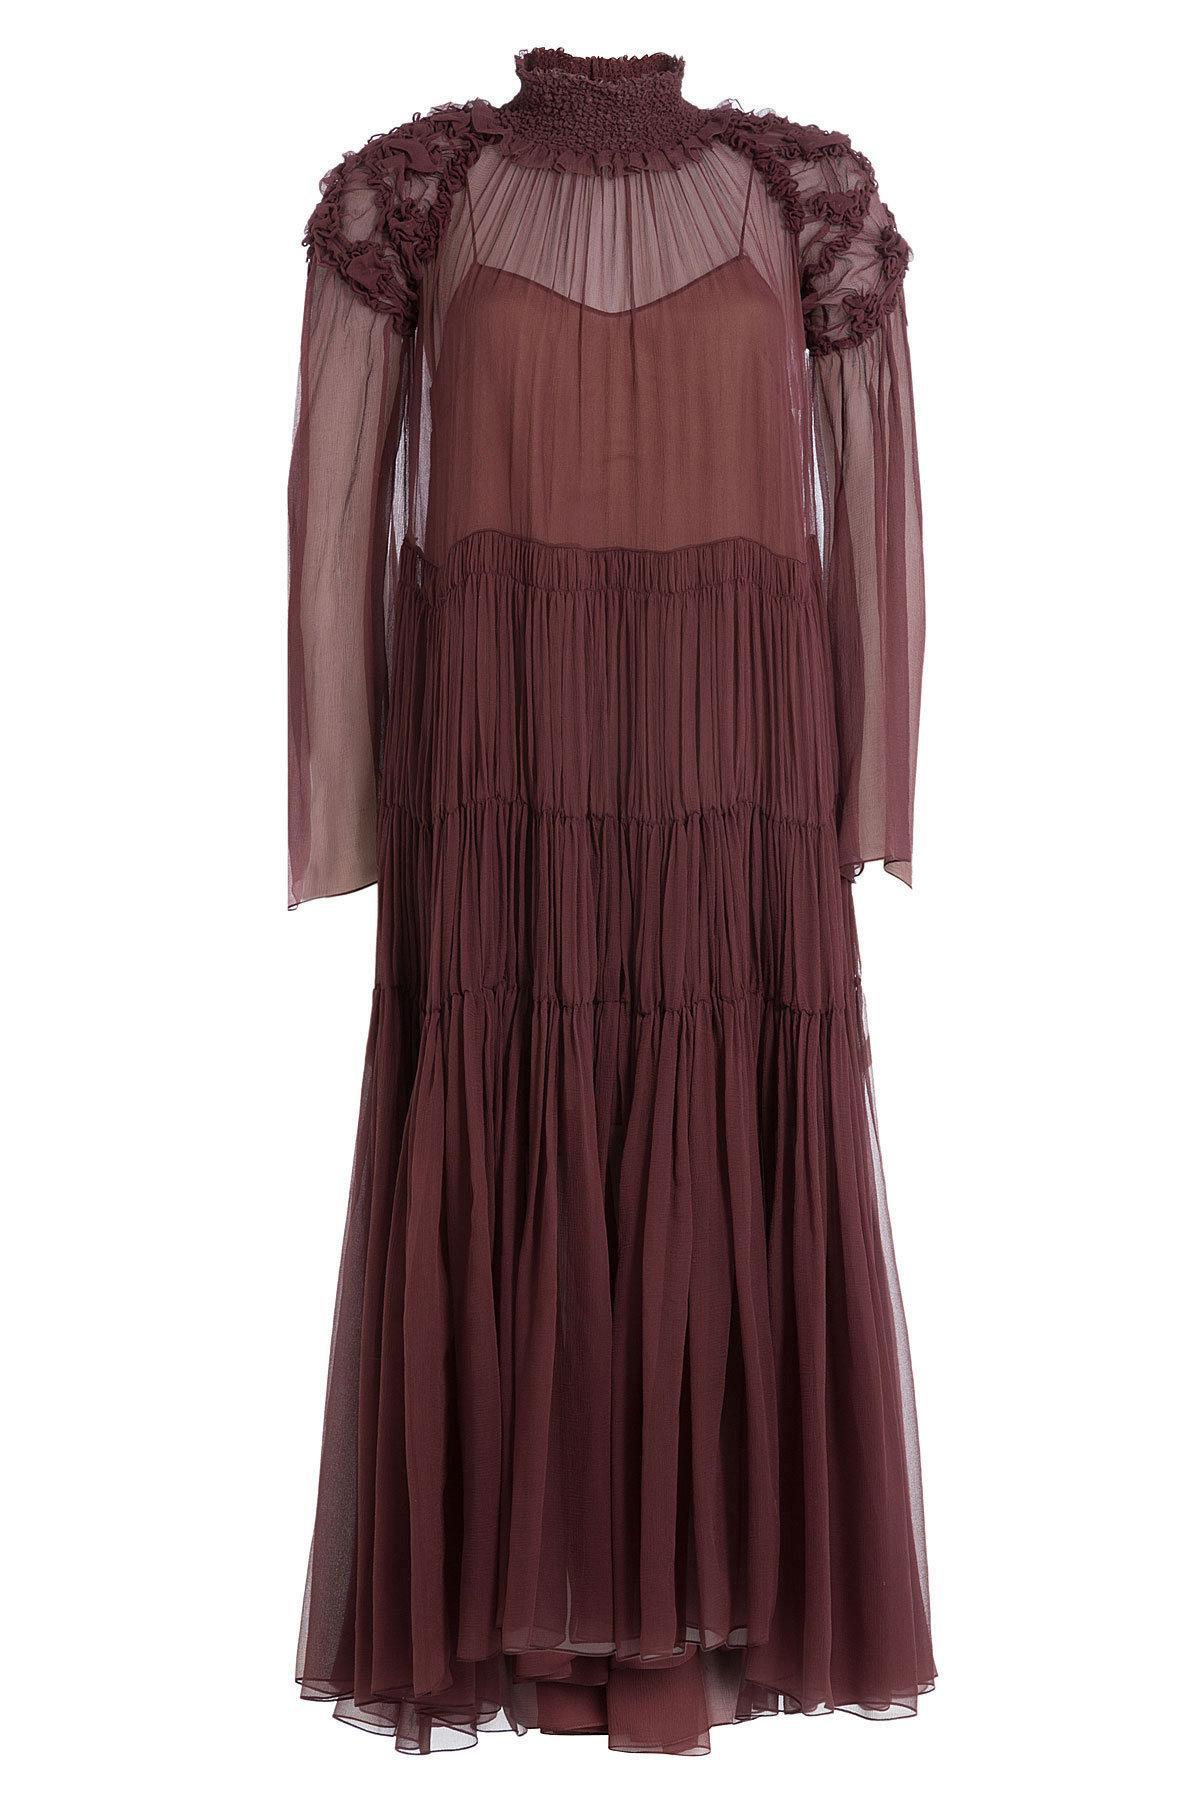 ChloÉ Silk Chiffon Dress In Red